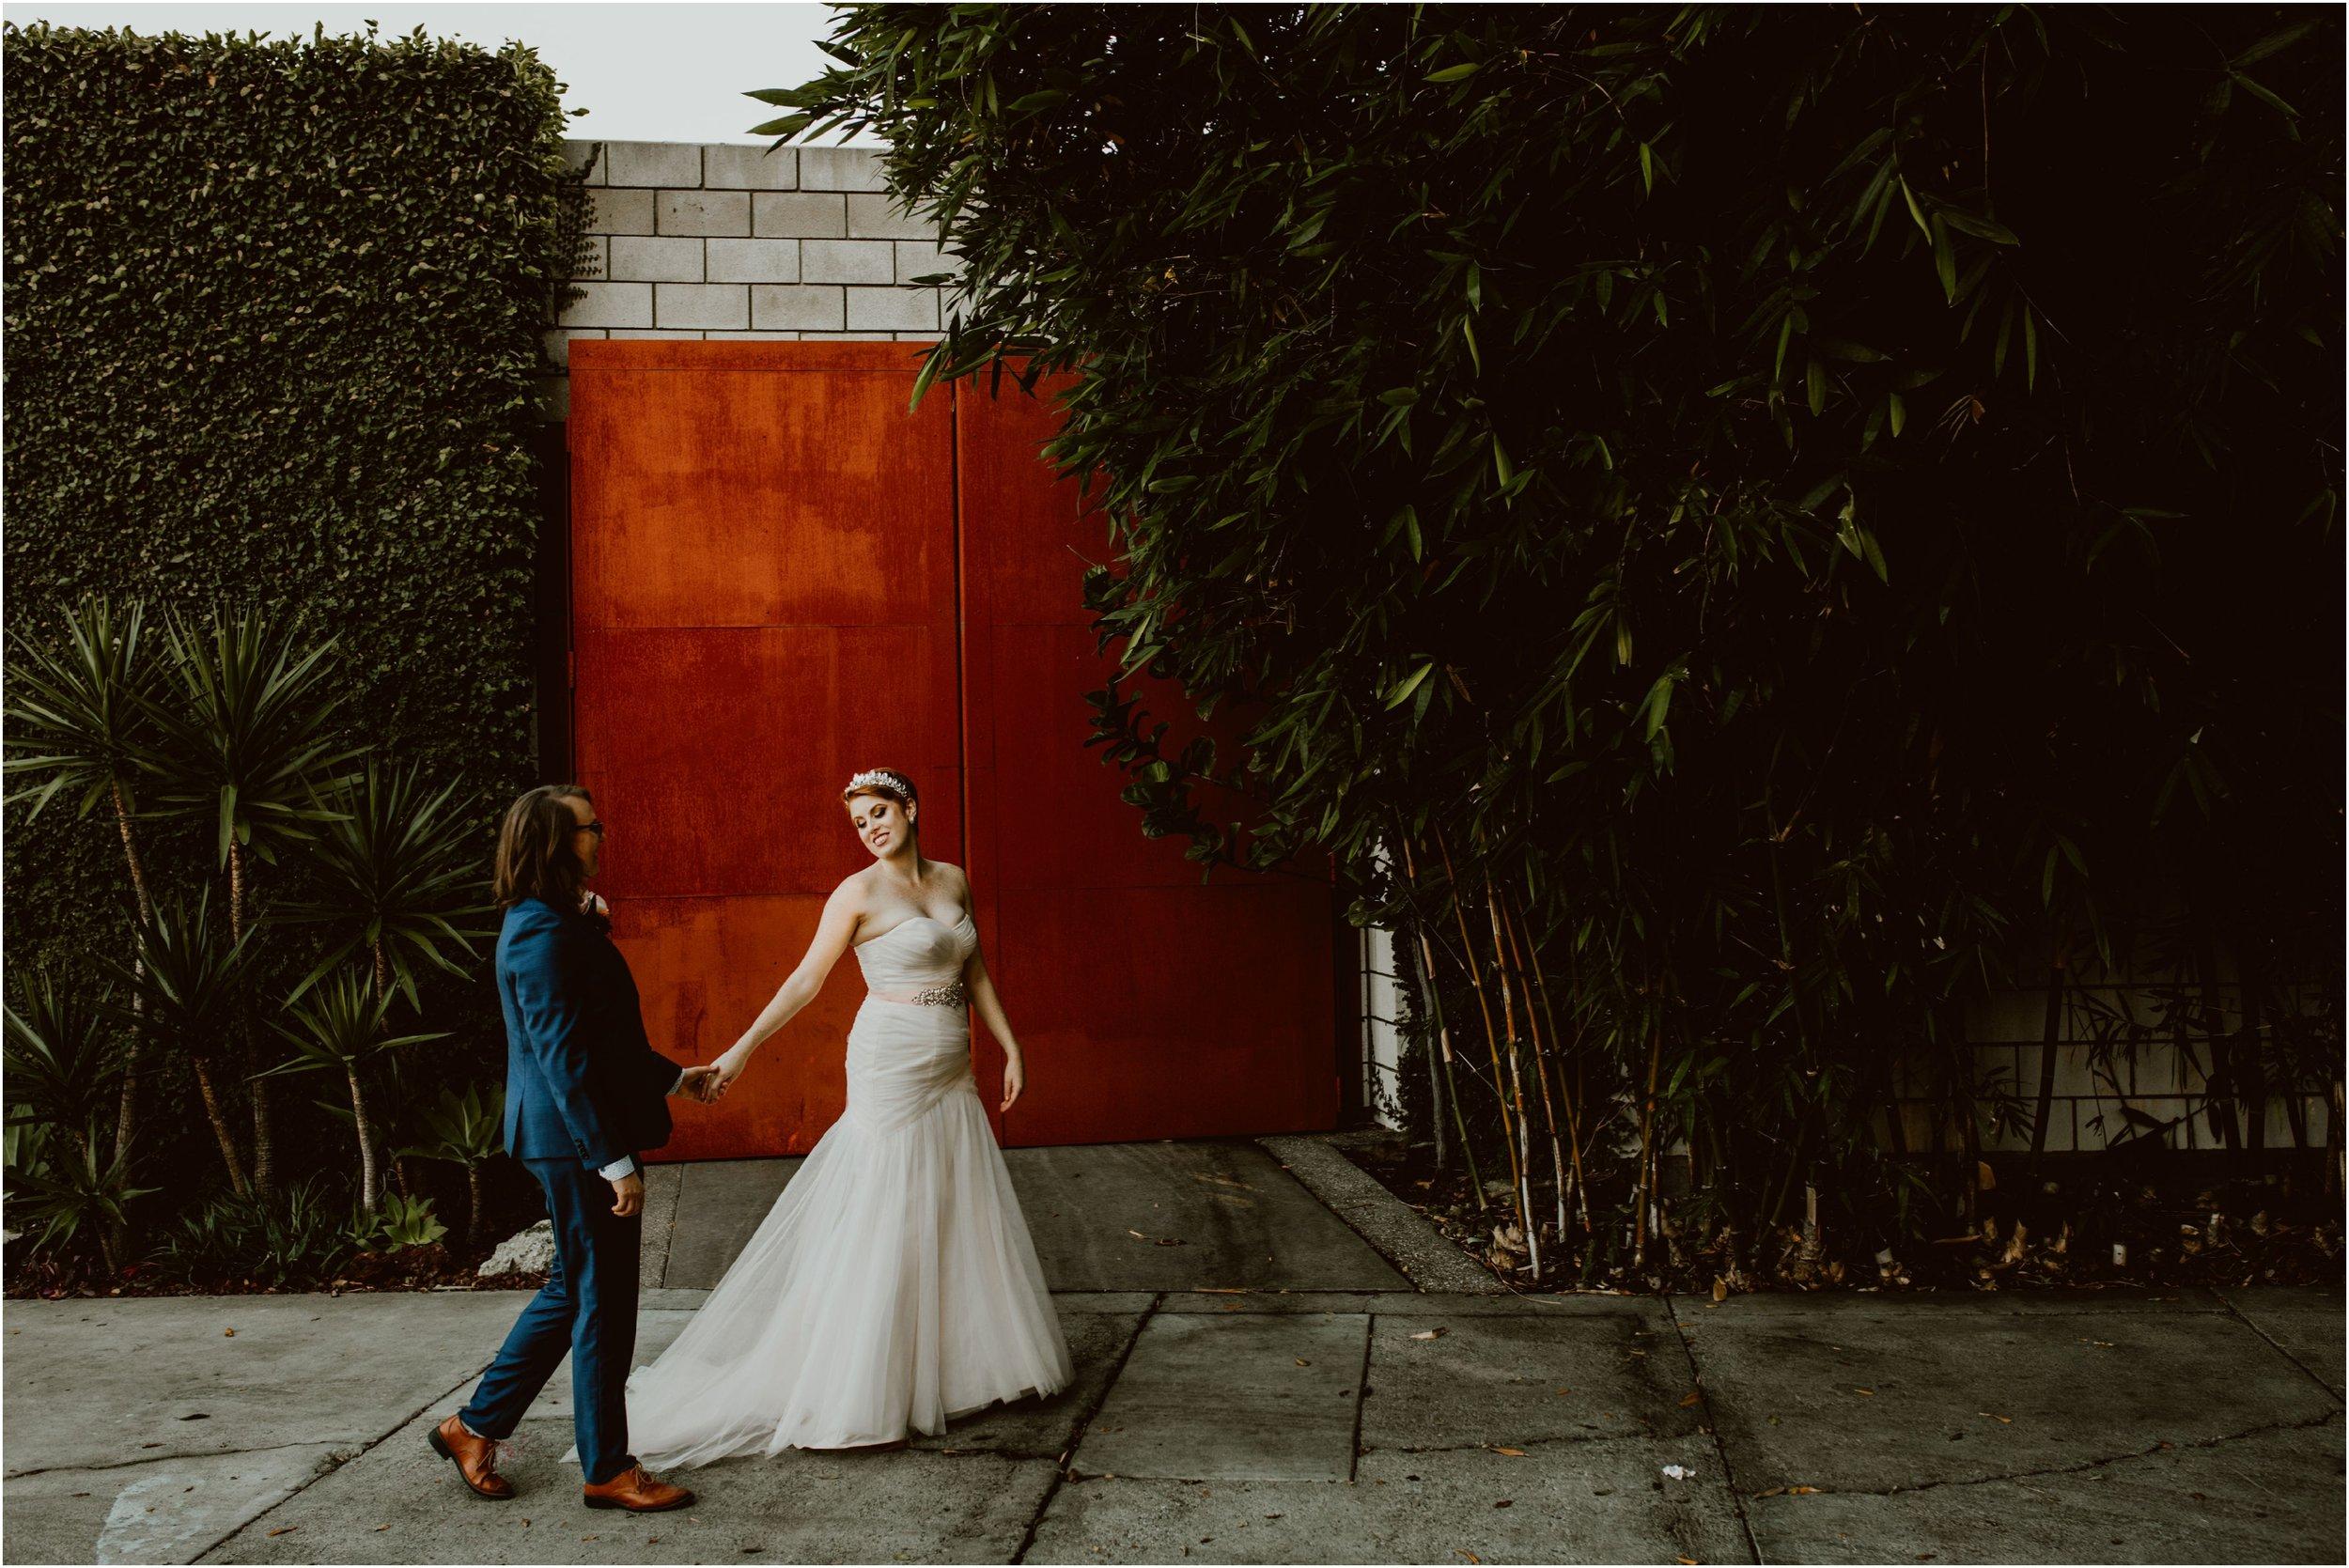 Smogshoppe-Wedding-S+C-Diana-Lake-Photography-649.jpg